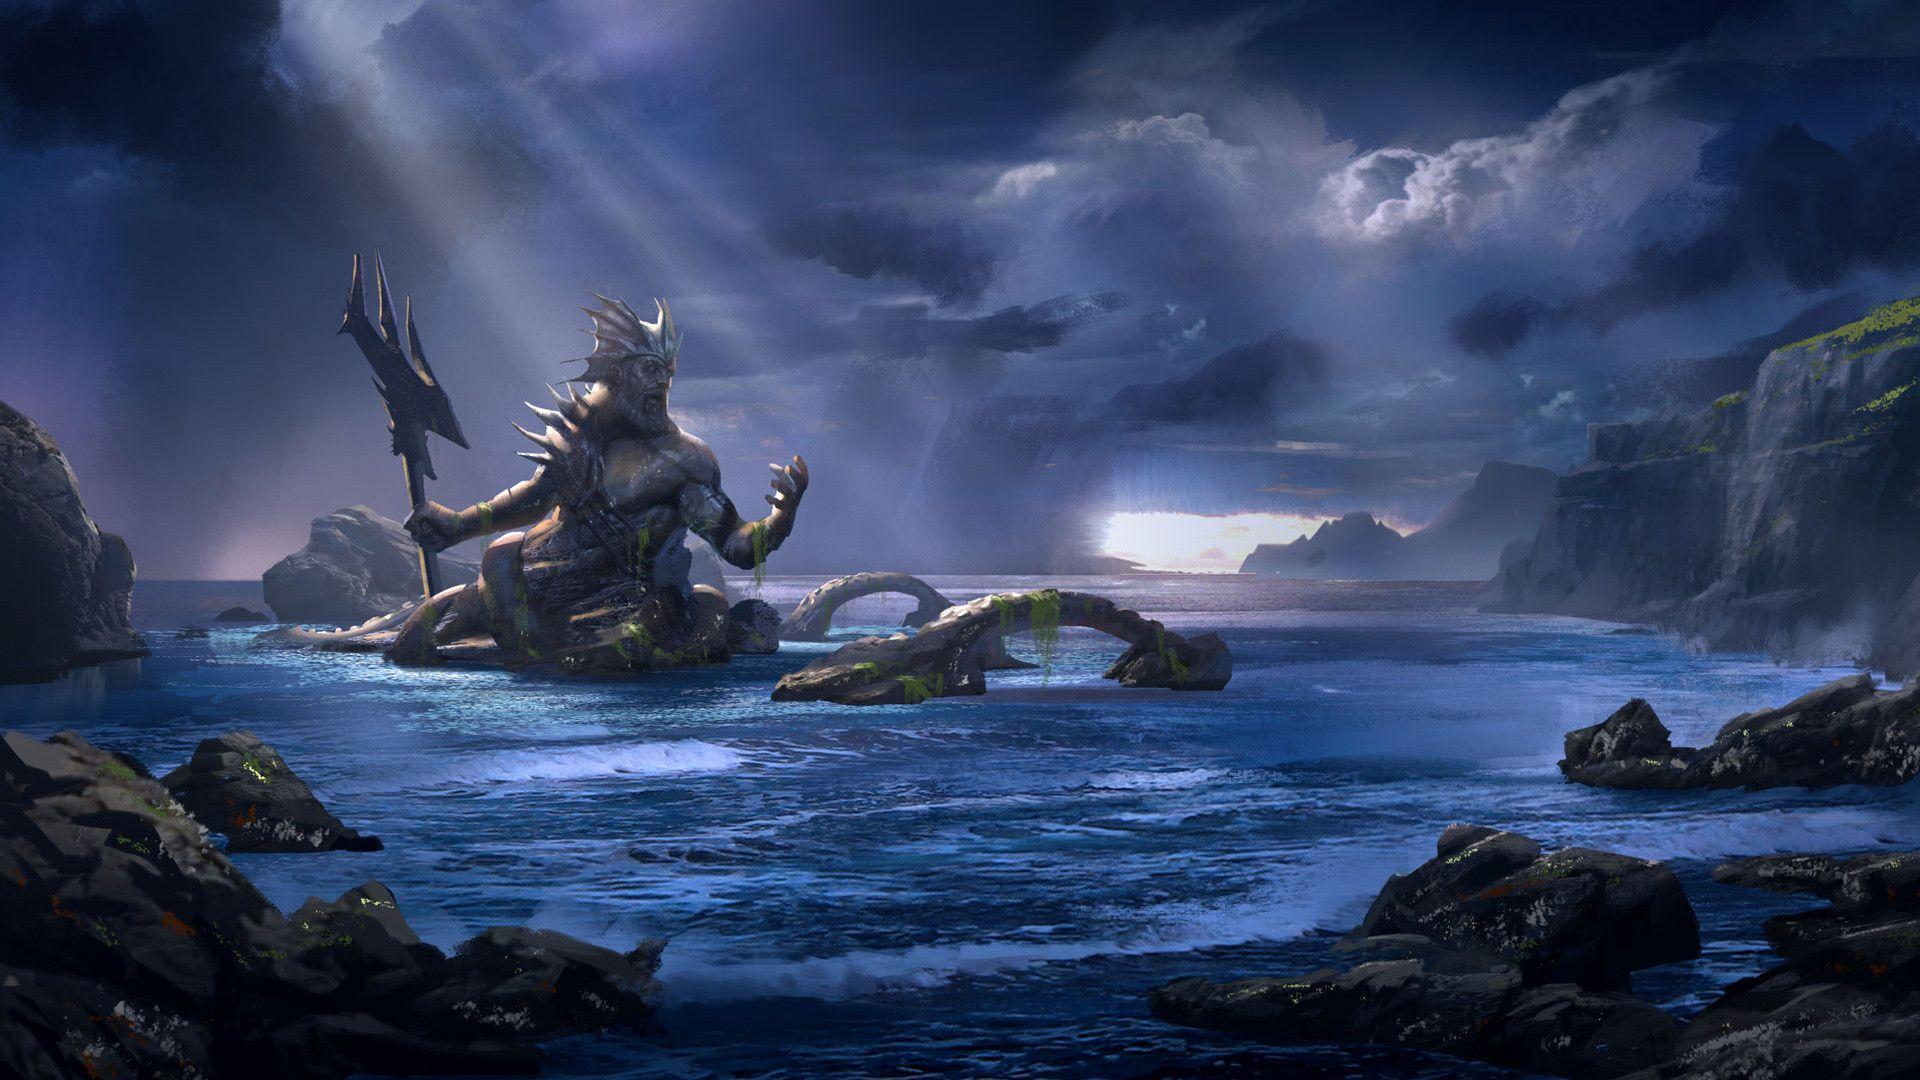 Lord Shiva Hd Desktop Wallpapers Wallpaper Cave